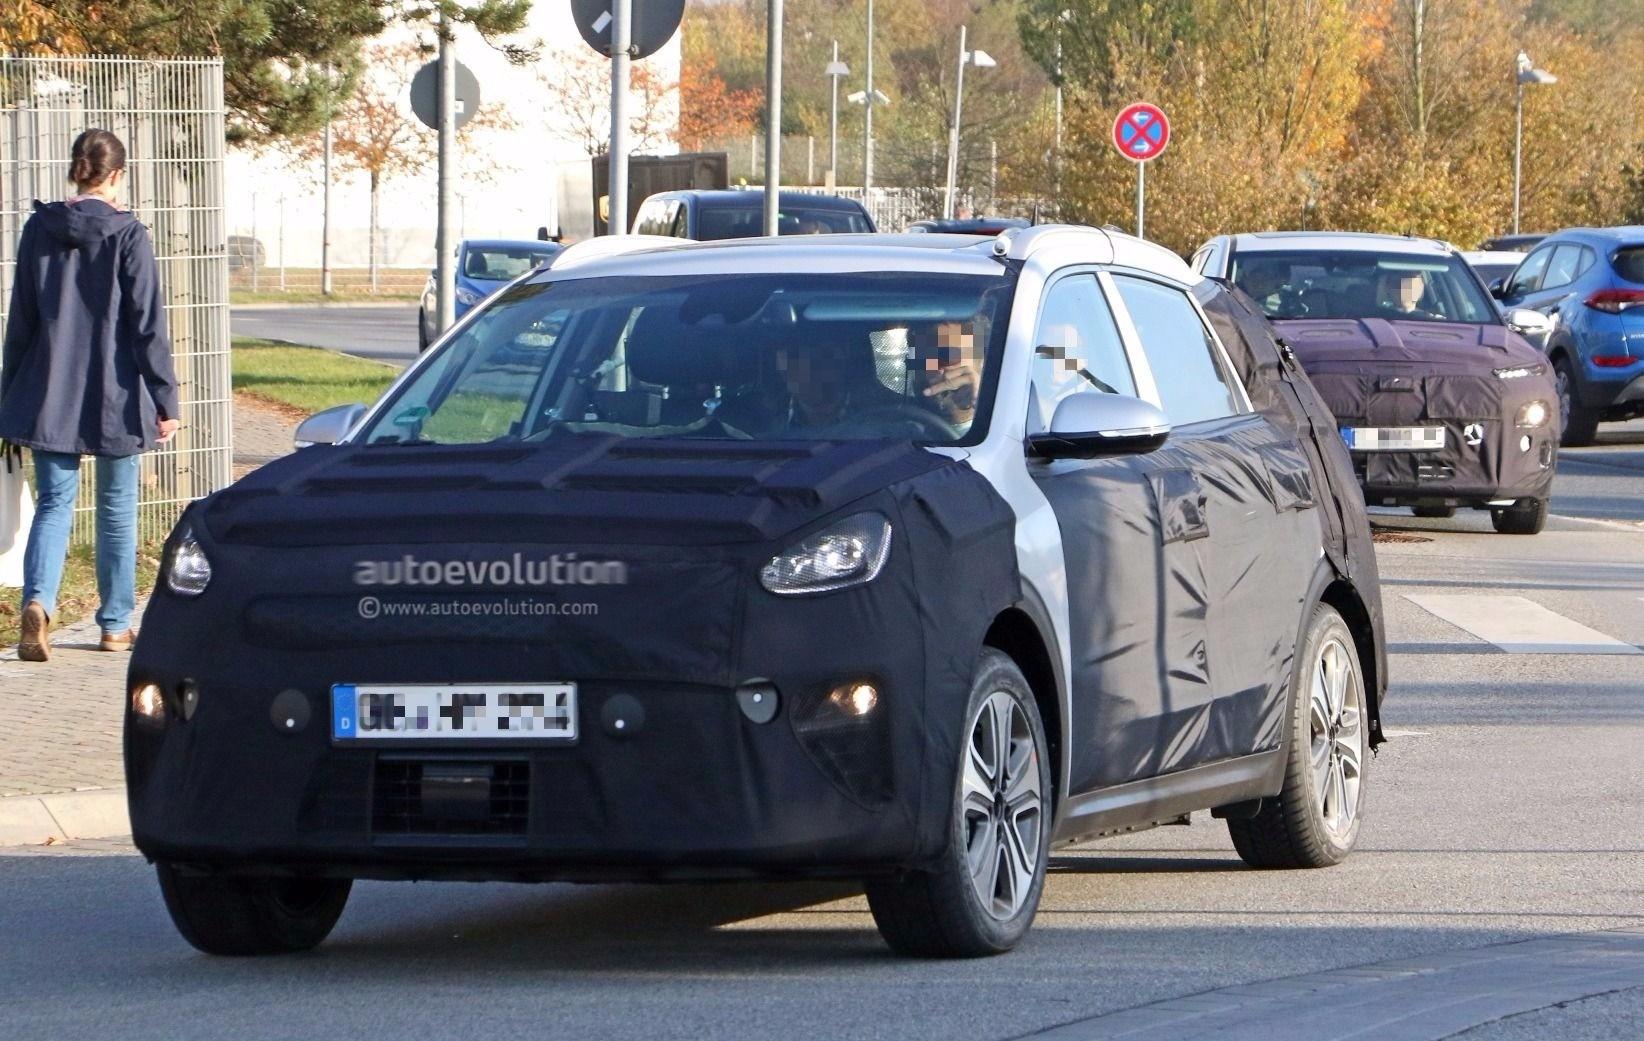 Hyundai Spy Shots >> Spyshots: 2019 Kia Niro Electric Parked Next To Hyundai Kona Electric In Germany - autoevolution